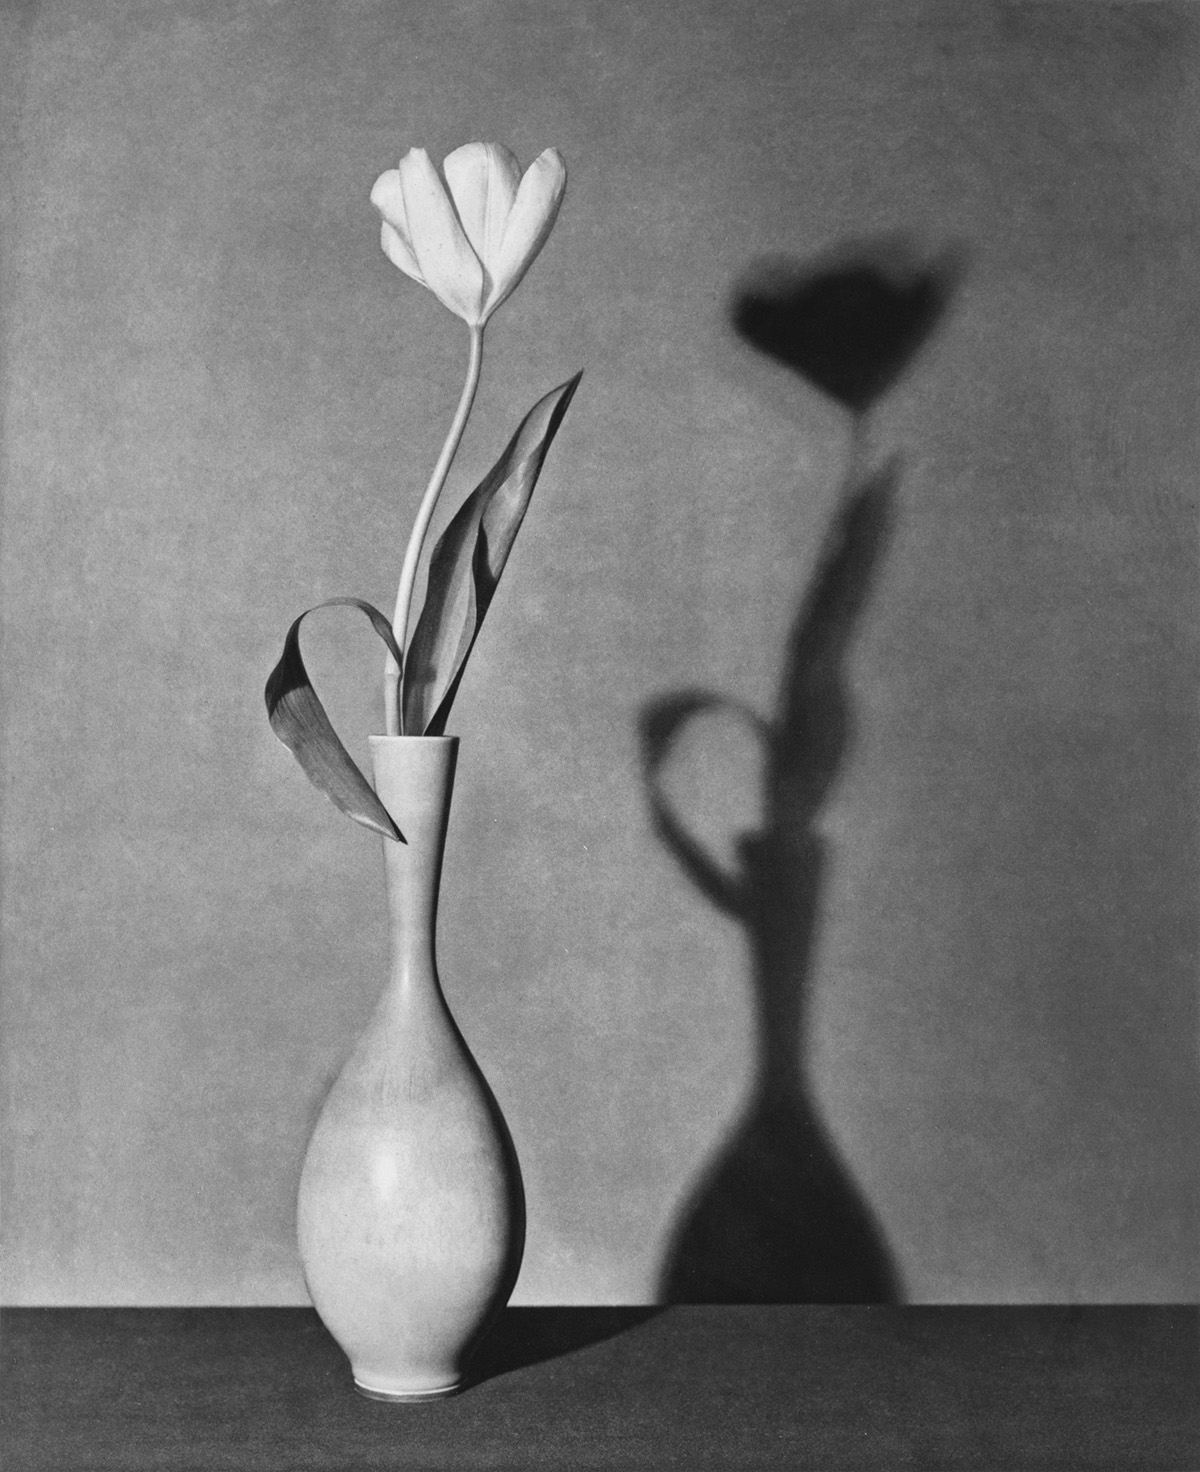 ROBERT MAPPLETHORPE (1946-1989) Tulip.